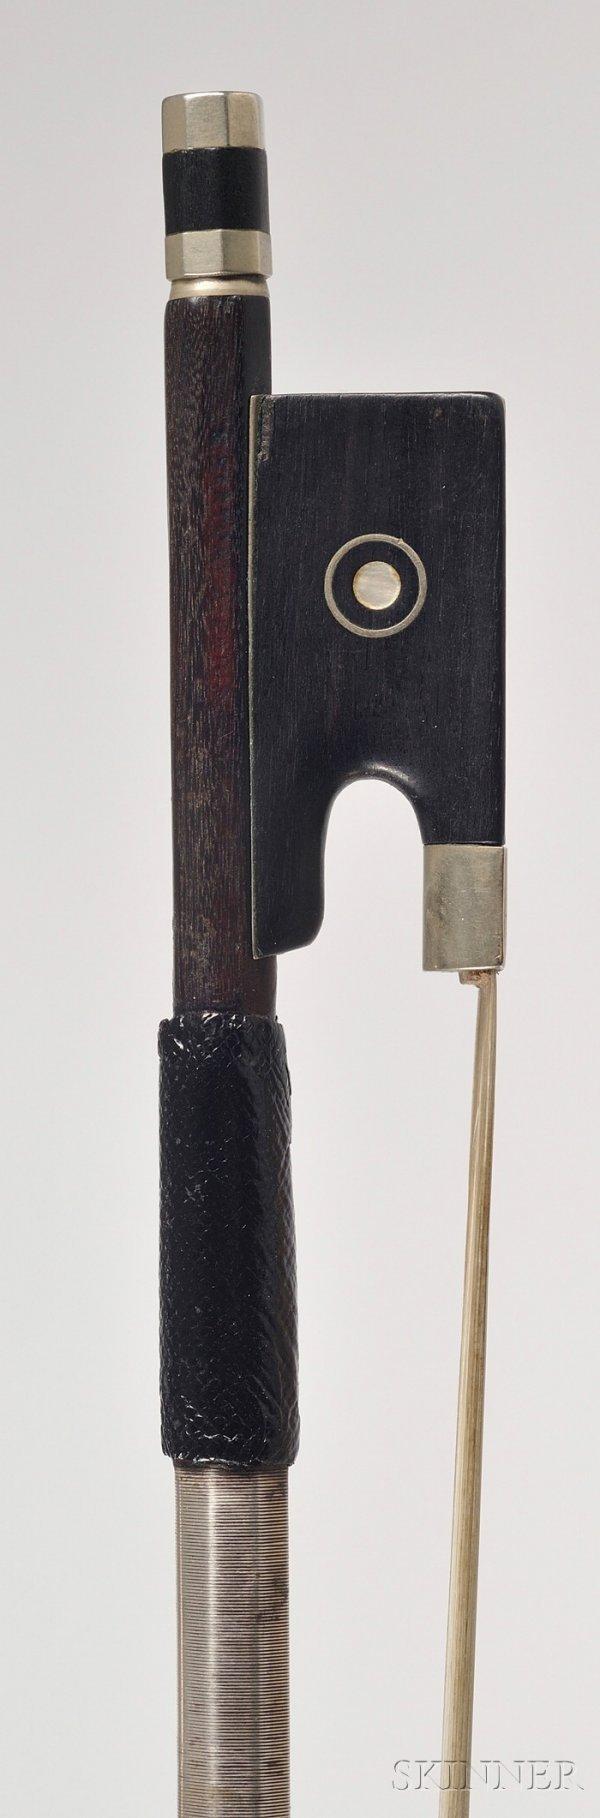 100: French Nickel Mounted Violin Bow, Eugene Sartory,